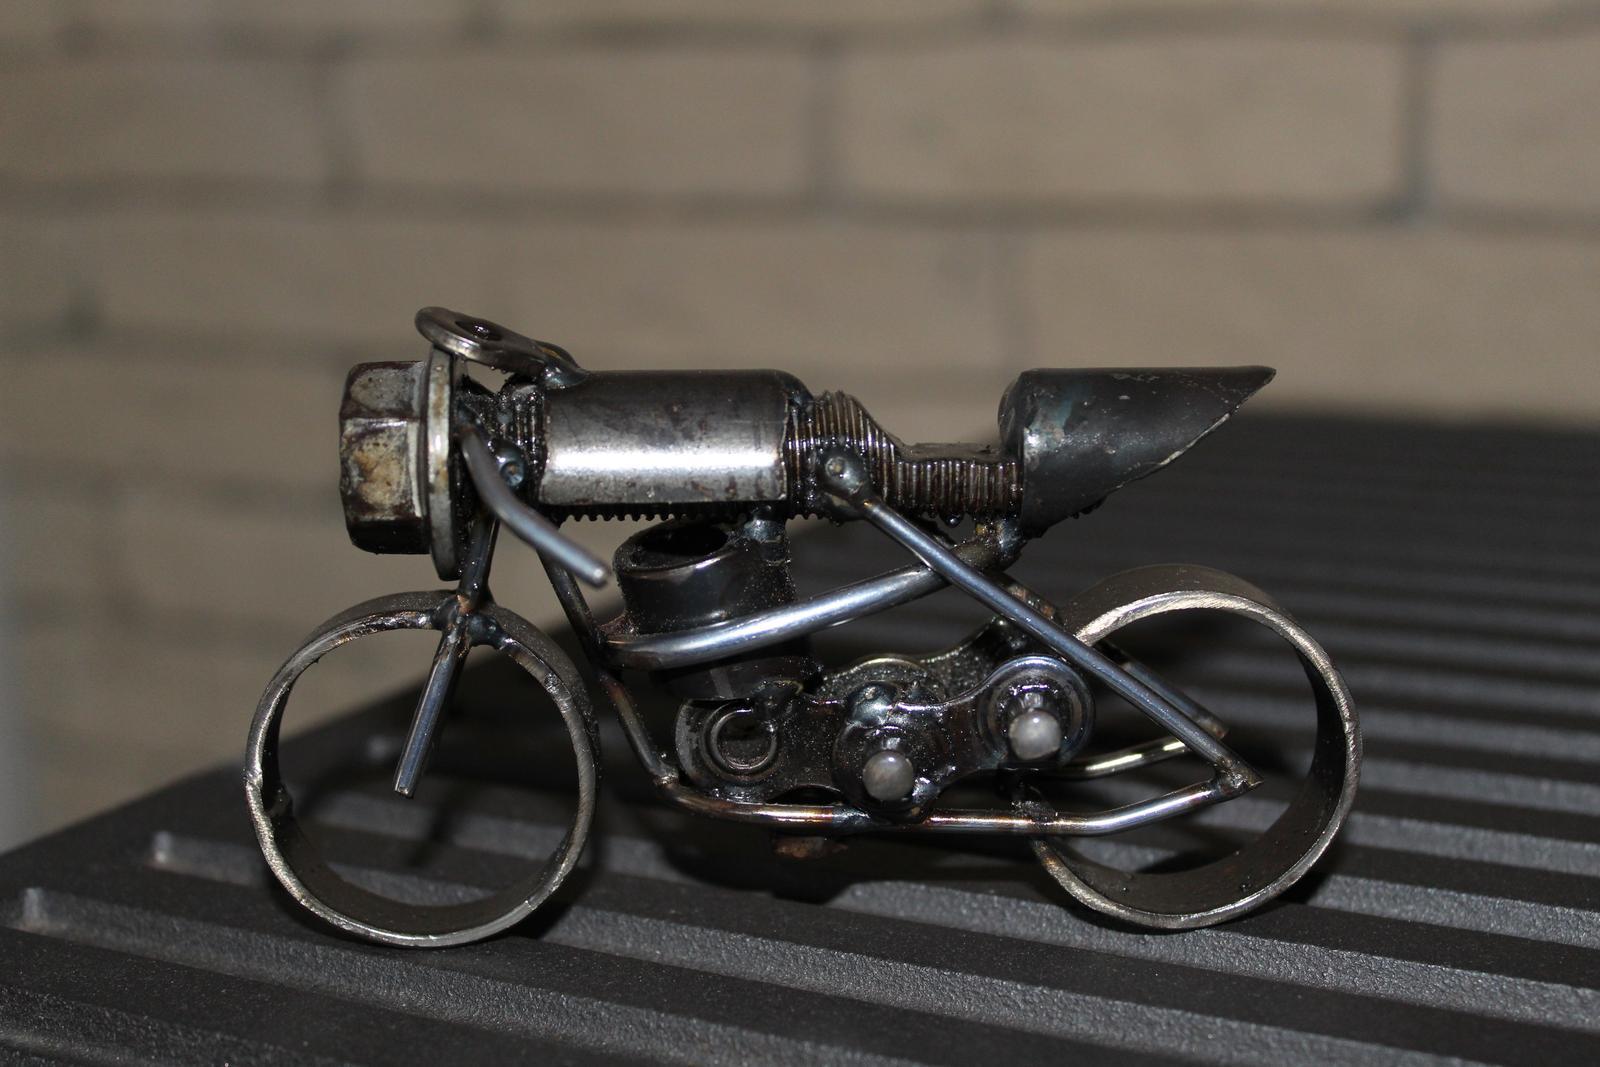 Motocykel malý - Obrázok č. 1